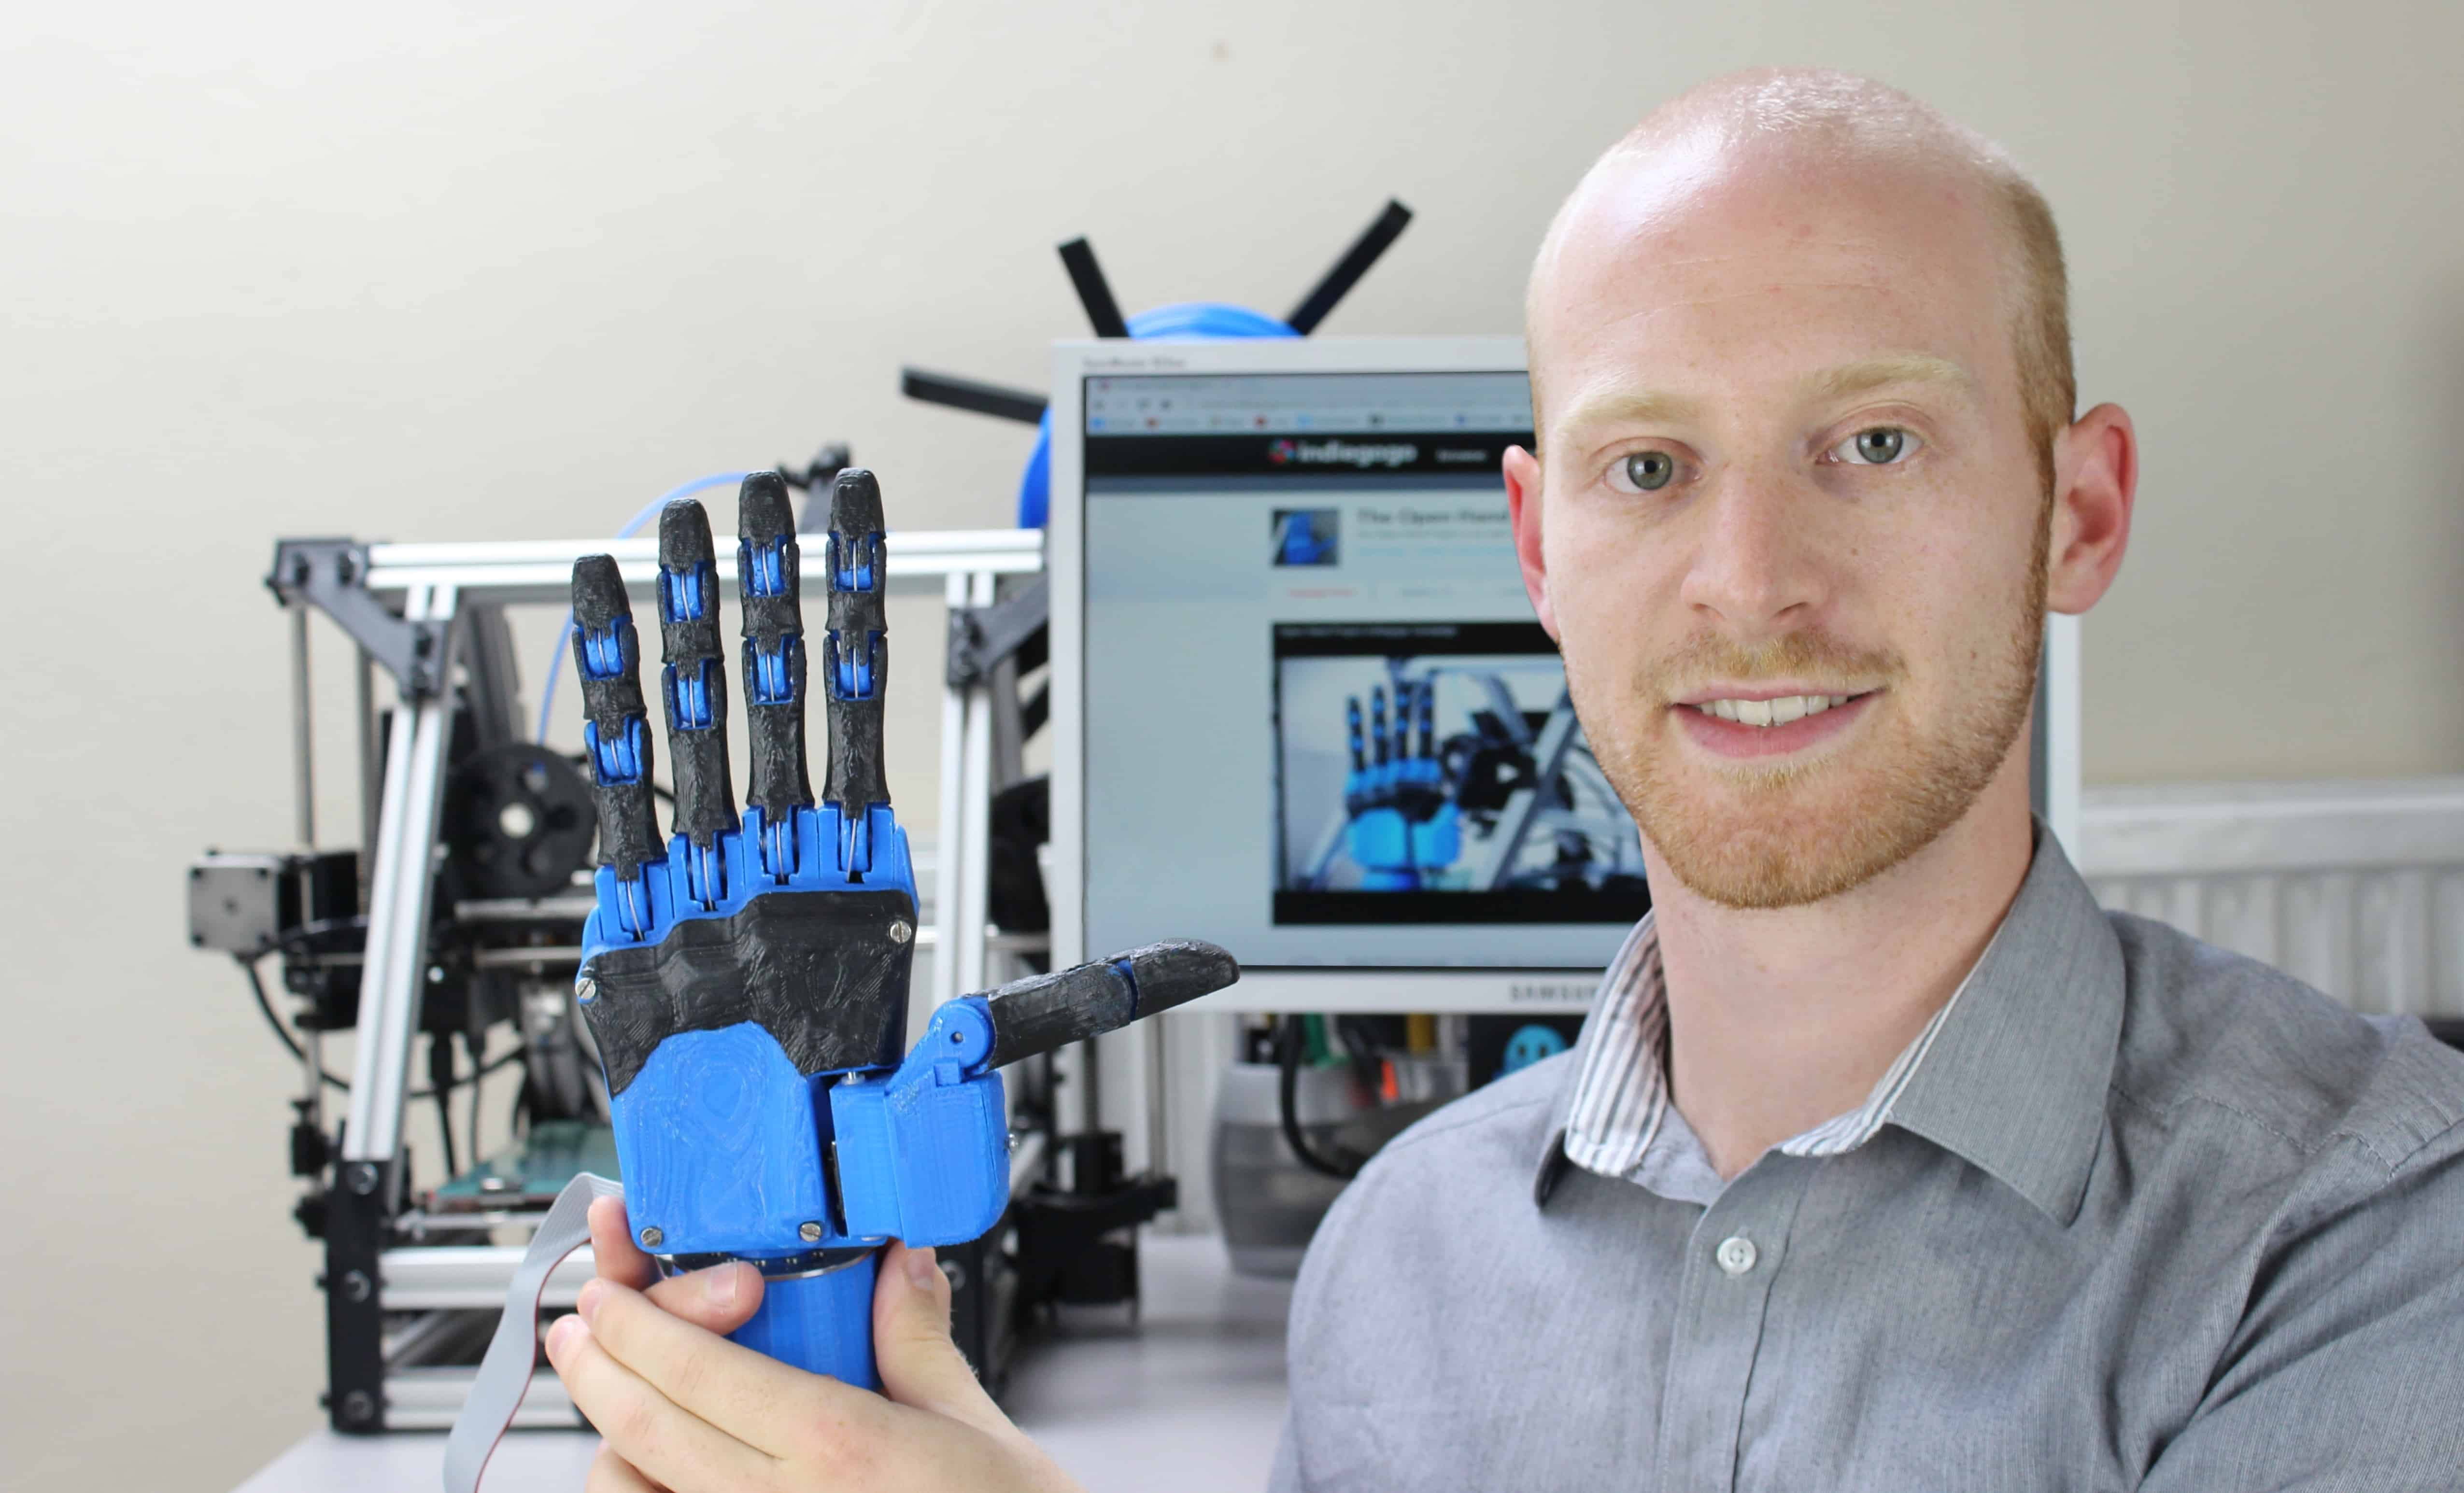 Joel Gibbard, founder of bristol-based robotics company openbionics holds a prosthetic hand